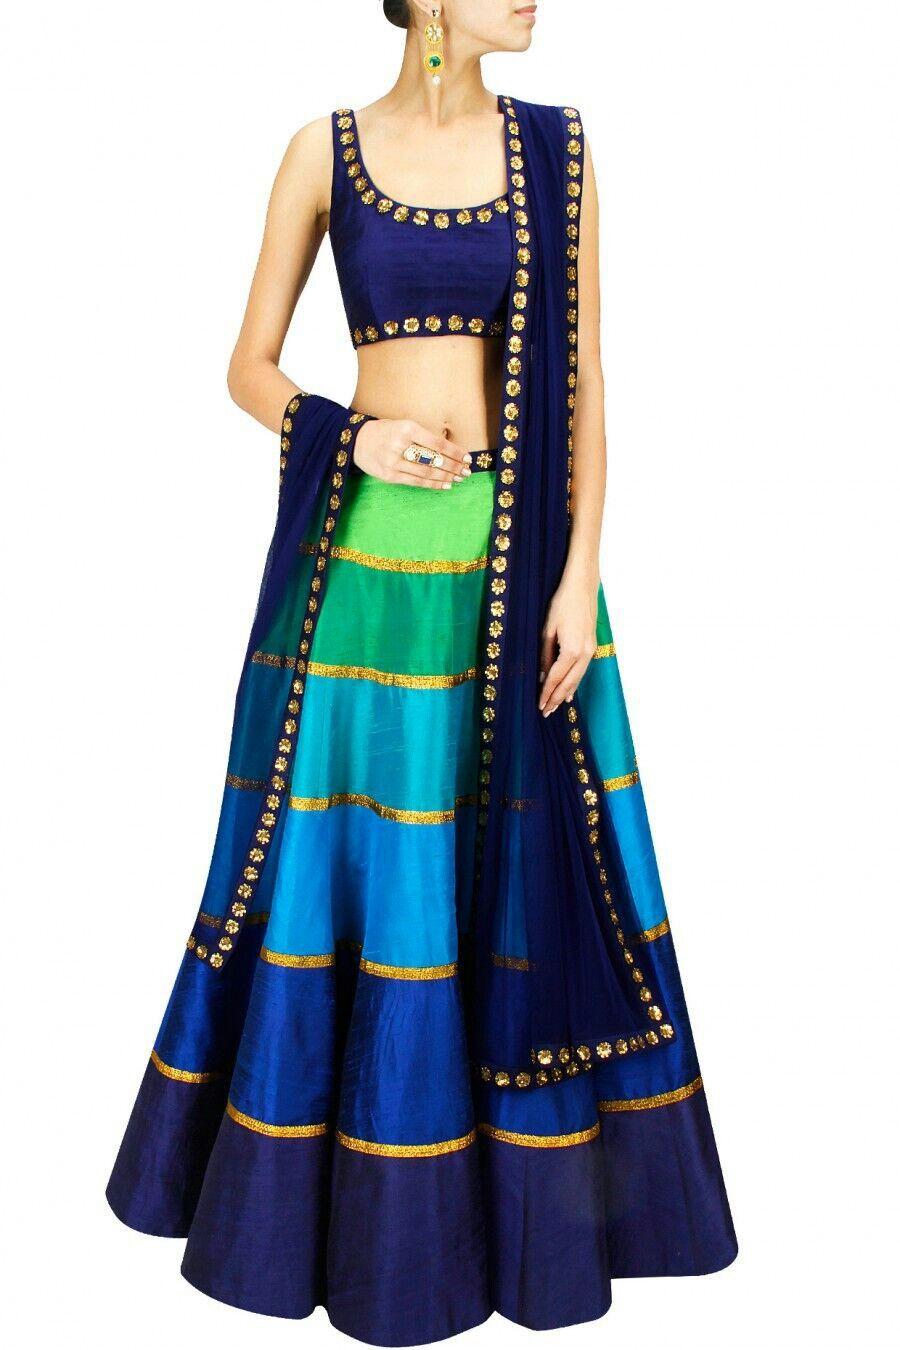 68e42b6408a7fc Blast this navratri For shop call or whatsapp on 8866222163 ...